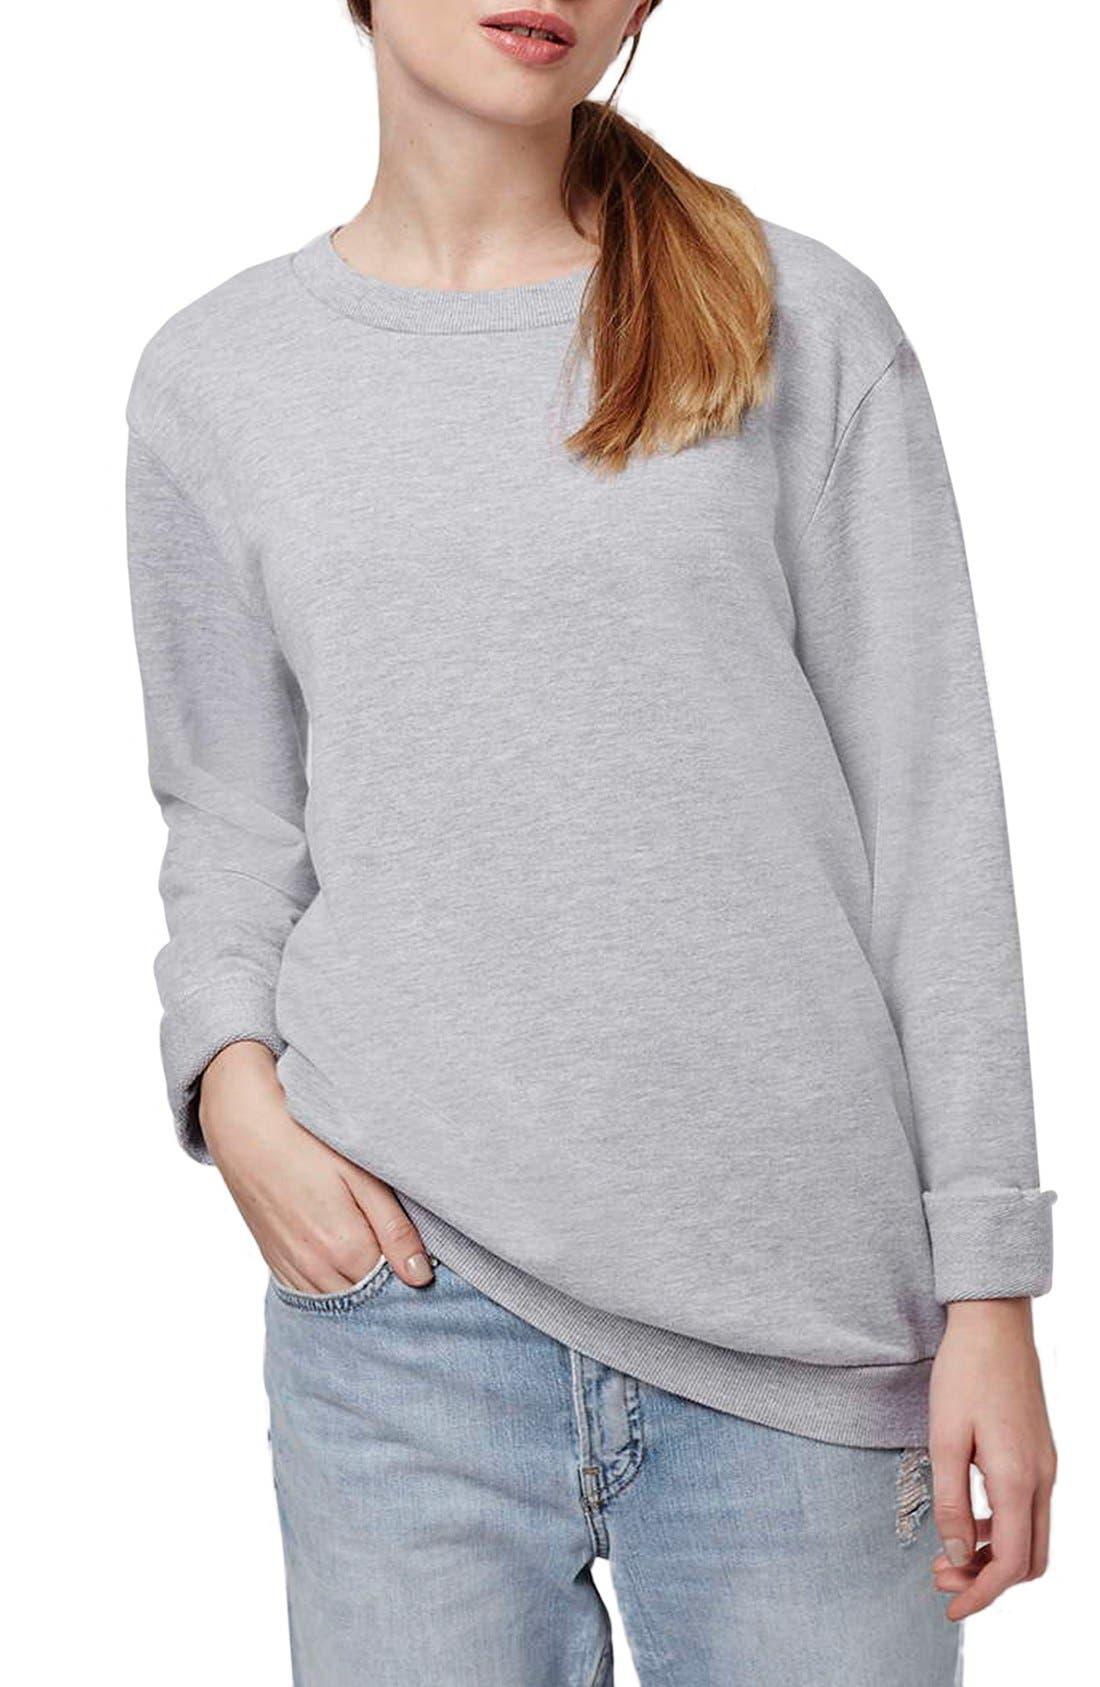 Alternate Image 1 Selected - Topshop Washed '90s Sweatshirt